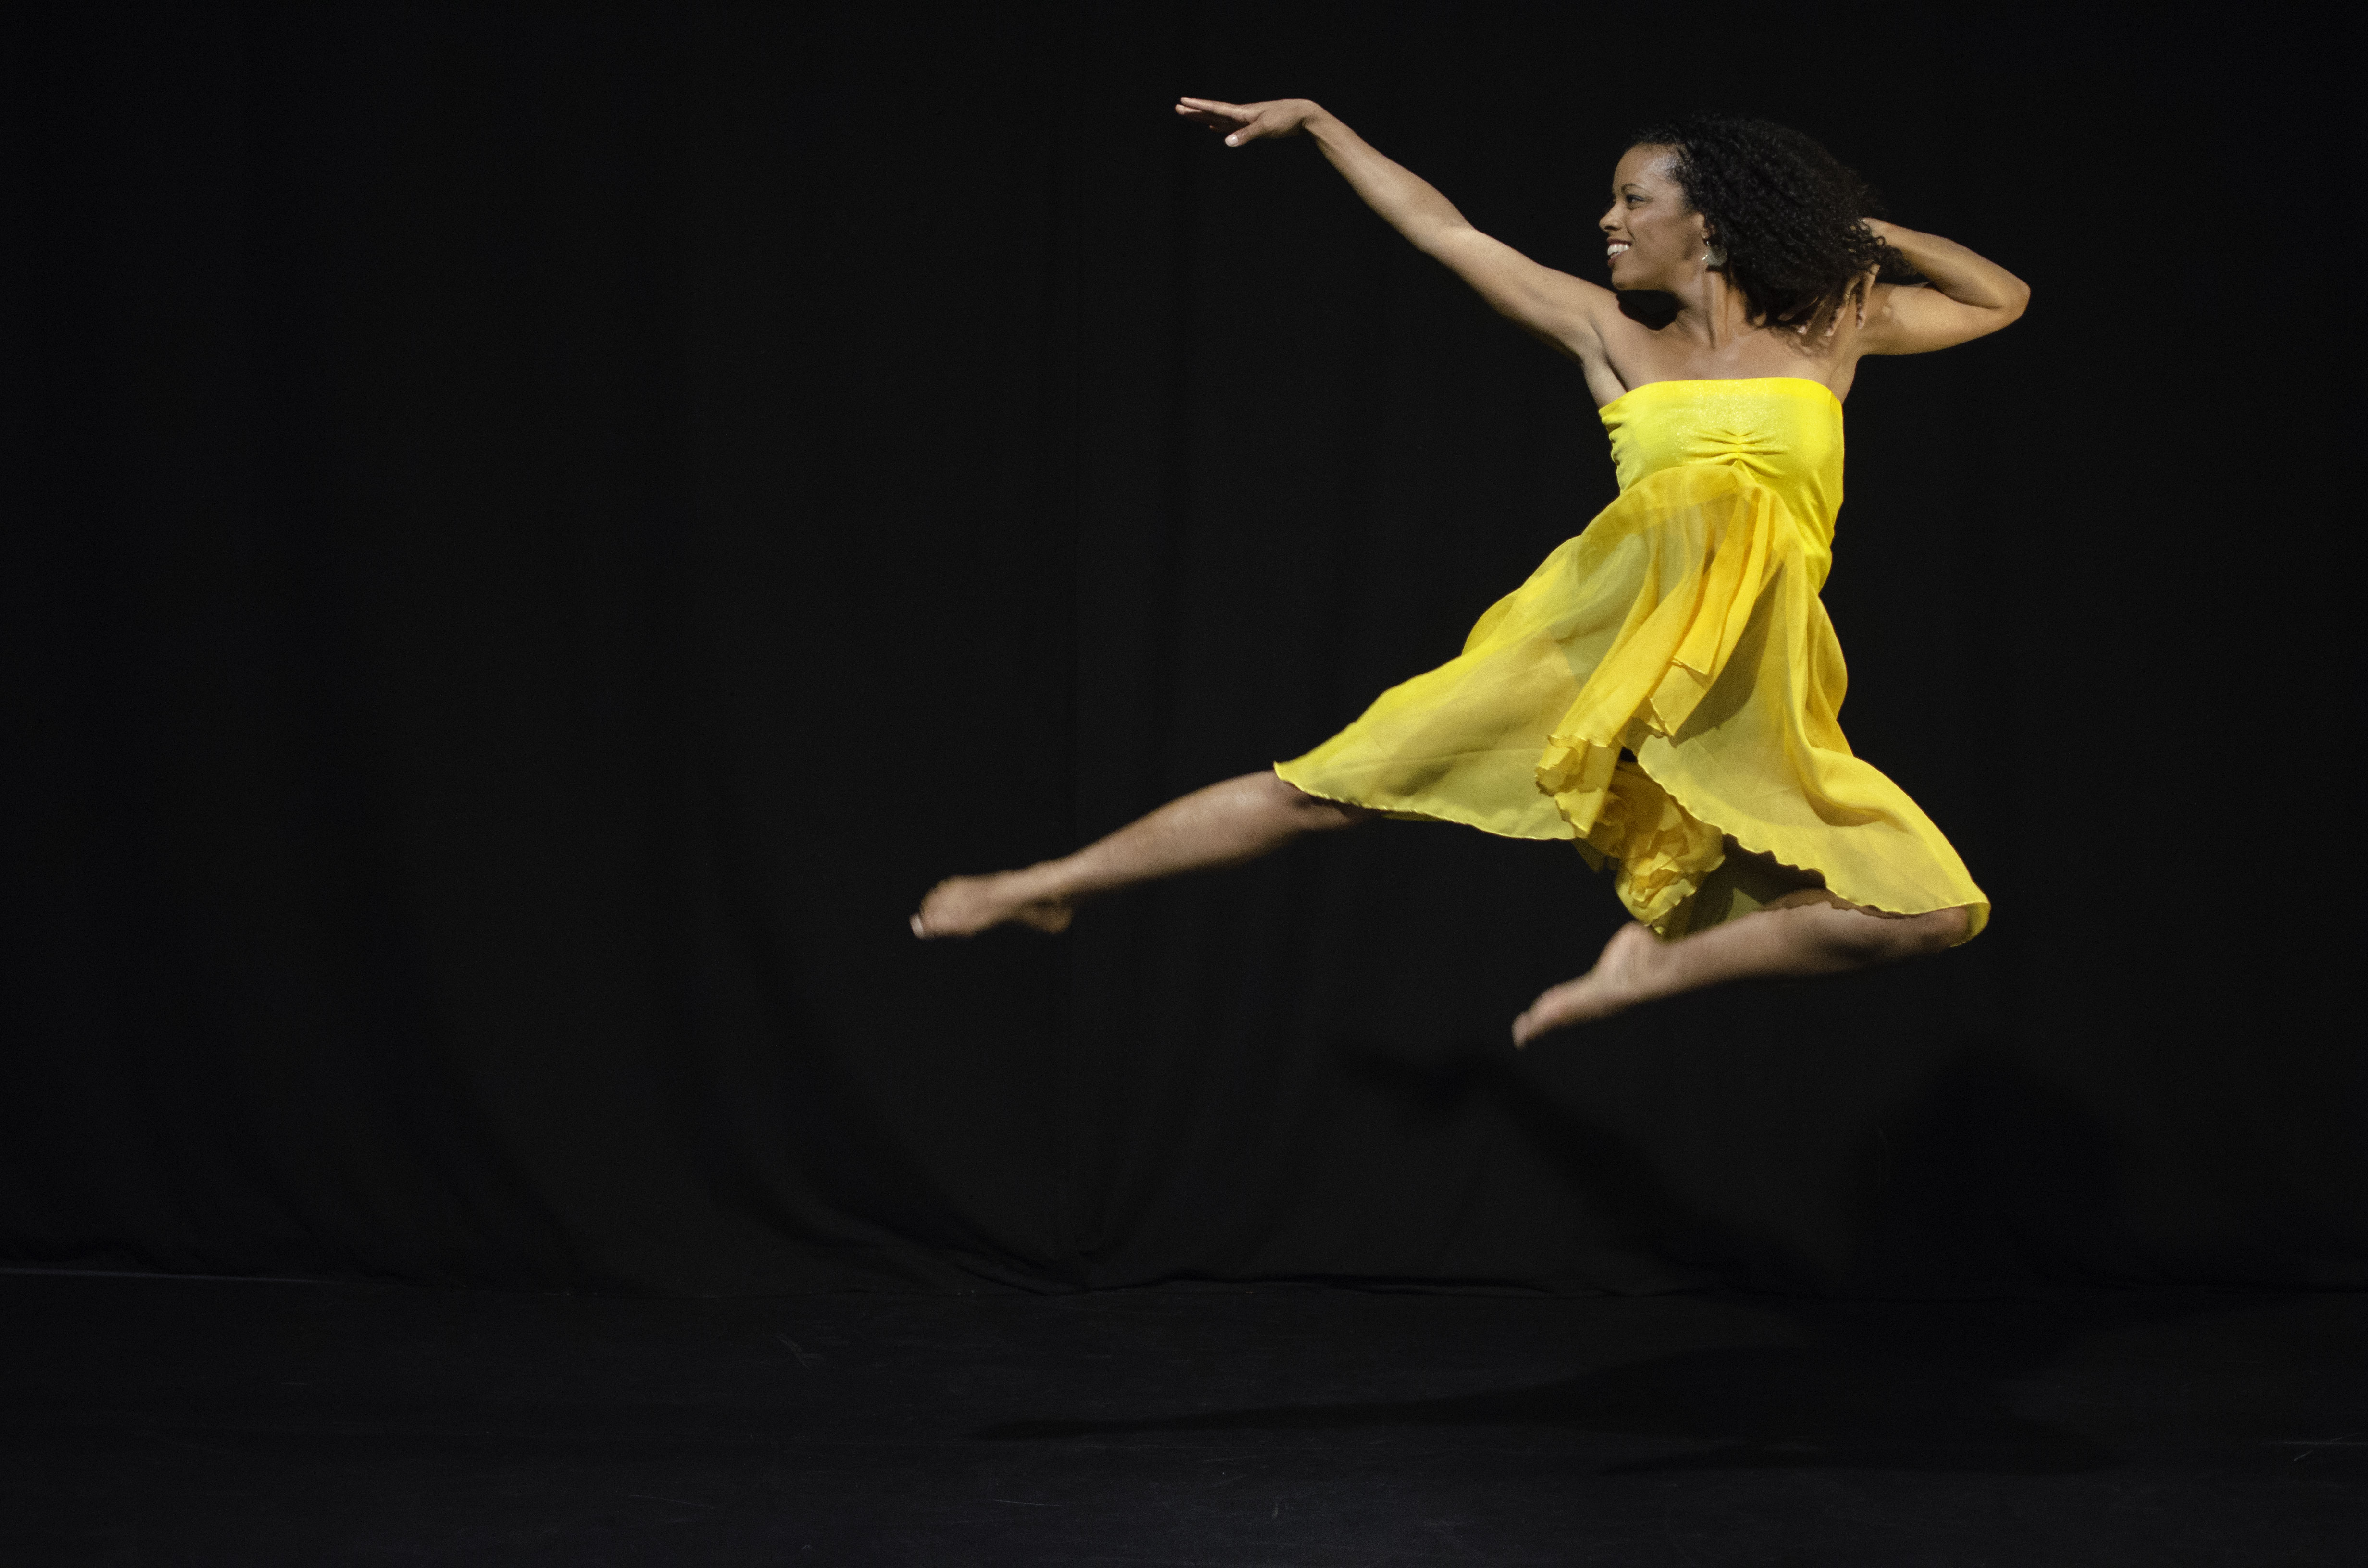 Cendrine-Joy-Jump.jpg